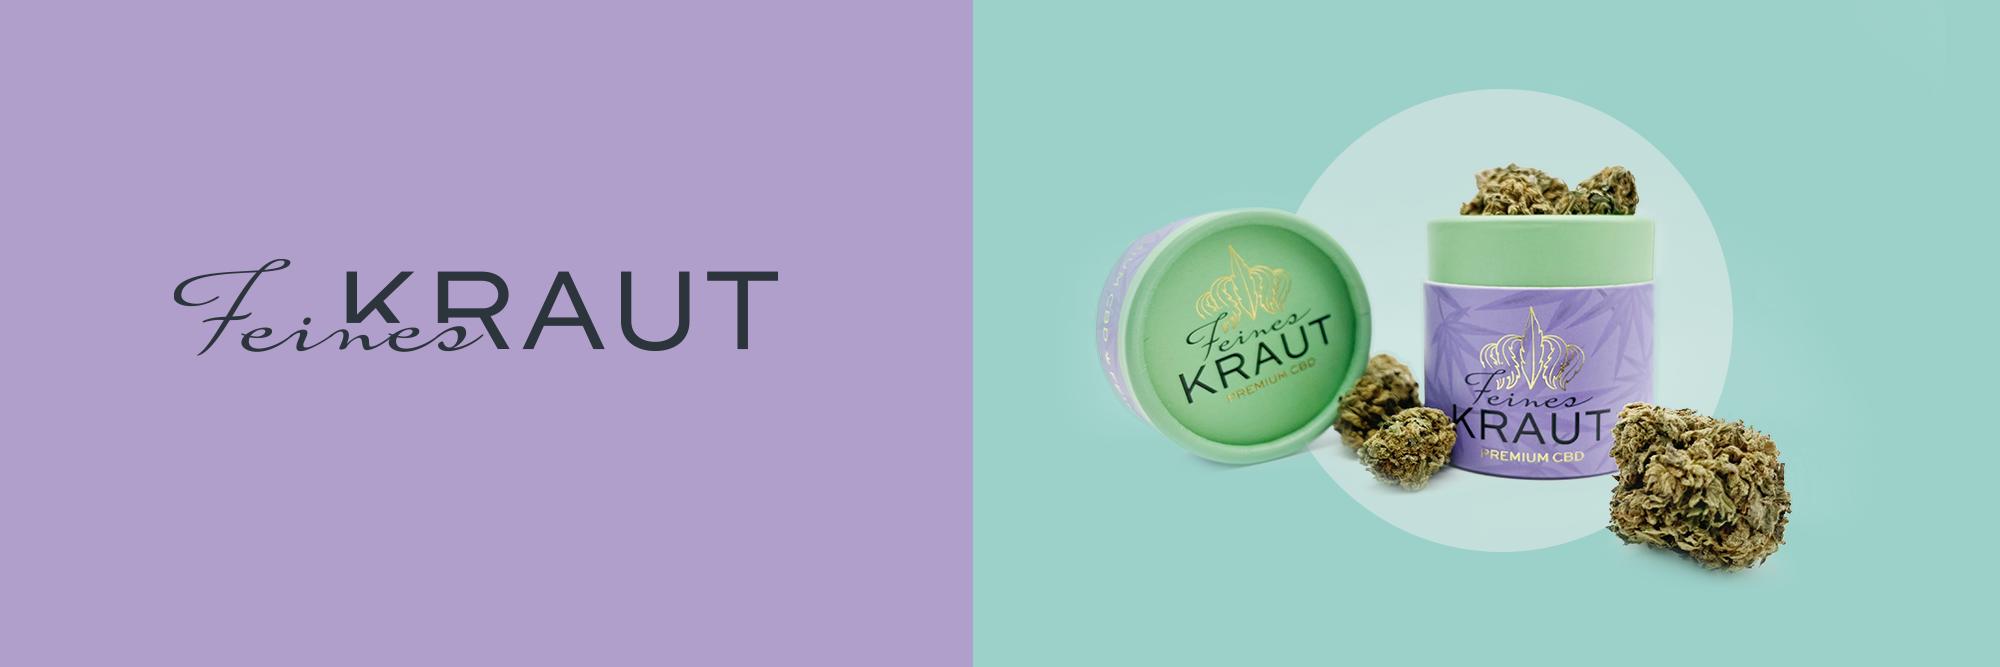 Feines Kraut e.U. | Premium CBD | Aromablüten | CBD Gras | CBD Weed